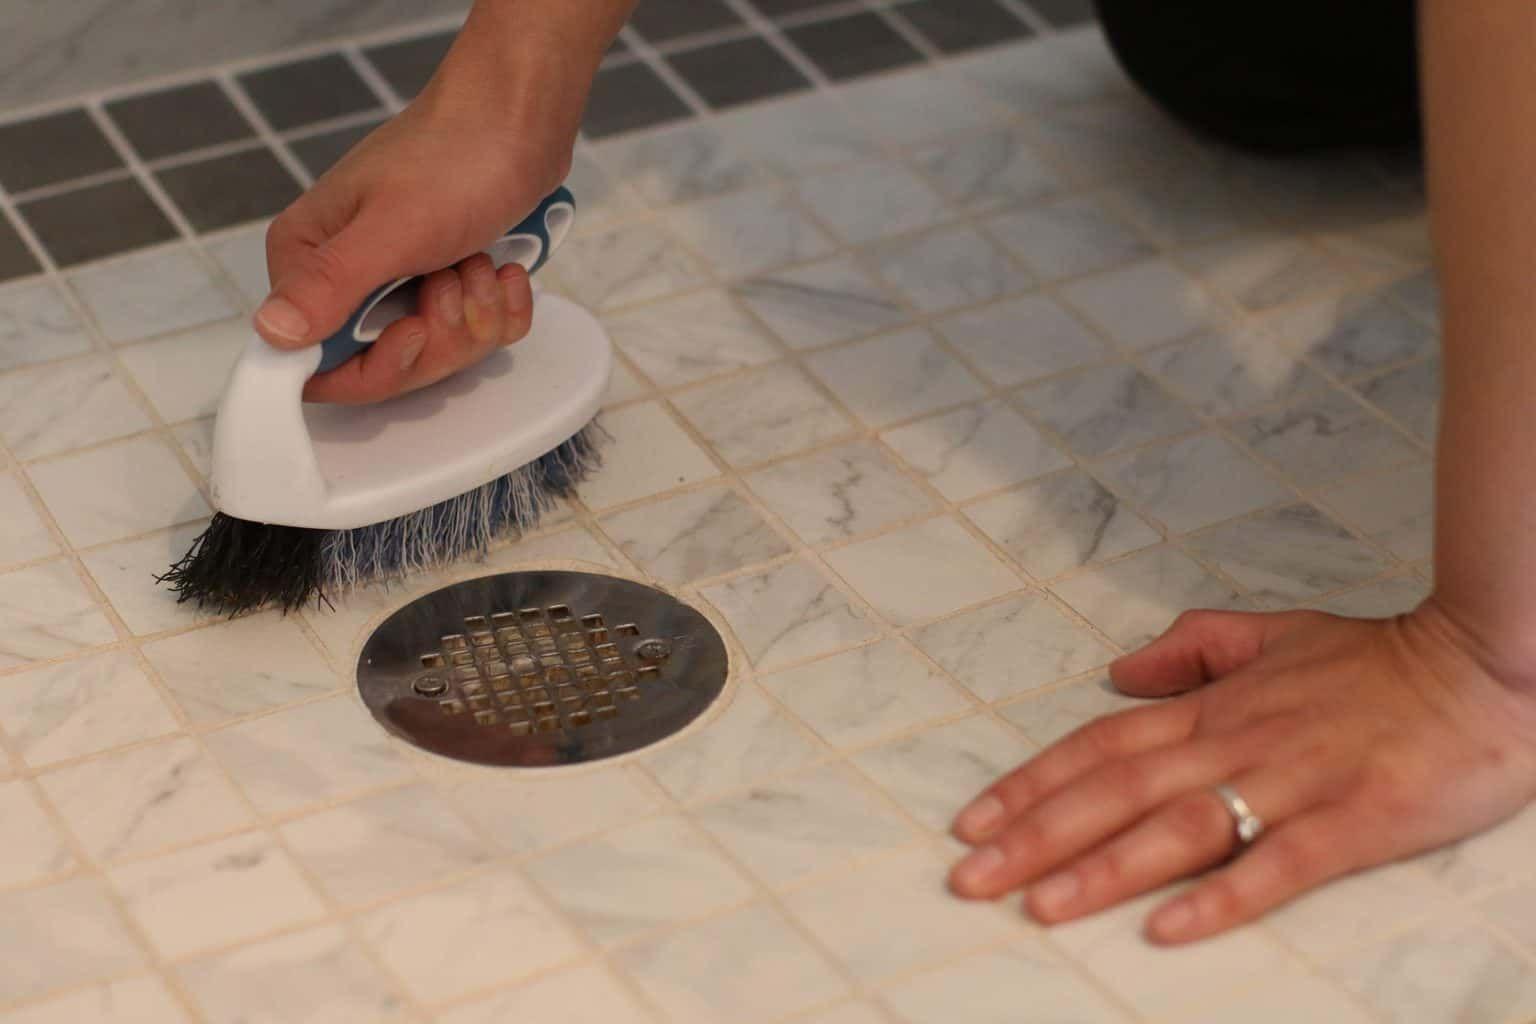 How To Make Tile Shine How To Make Tiles Cleaning Ceramic Tiles Shine Tile